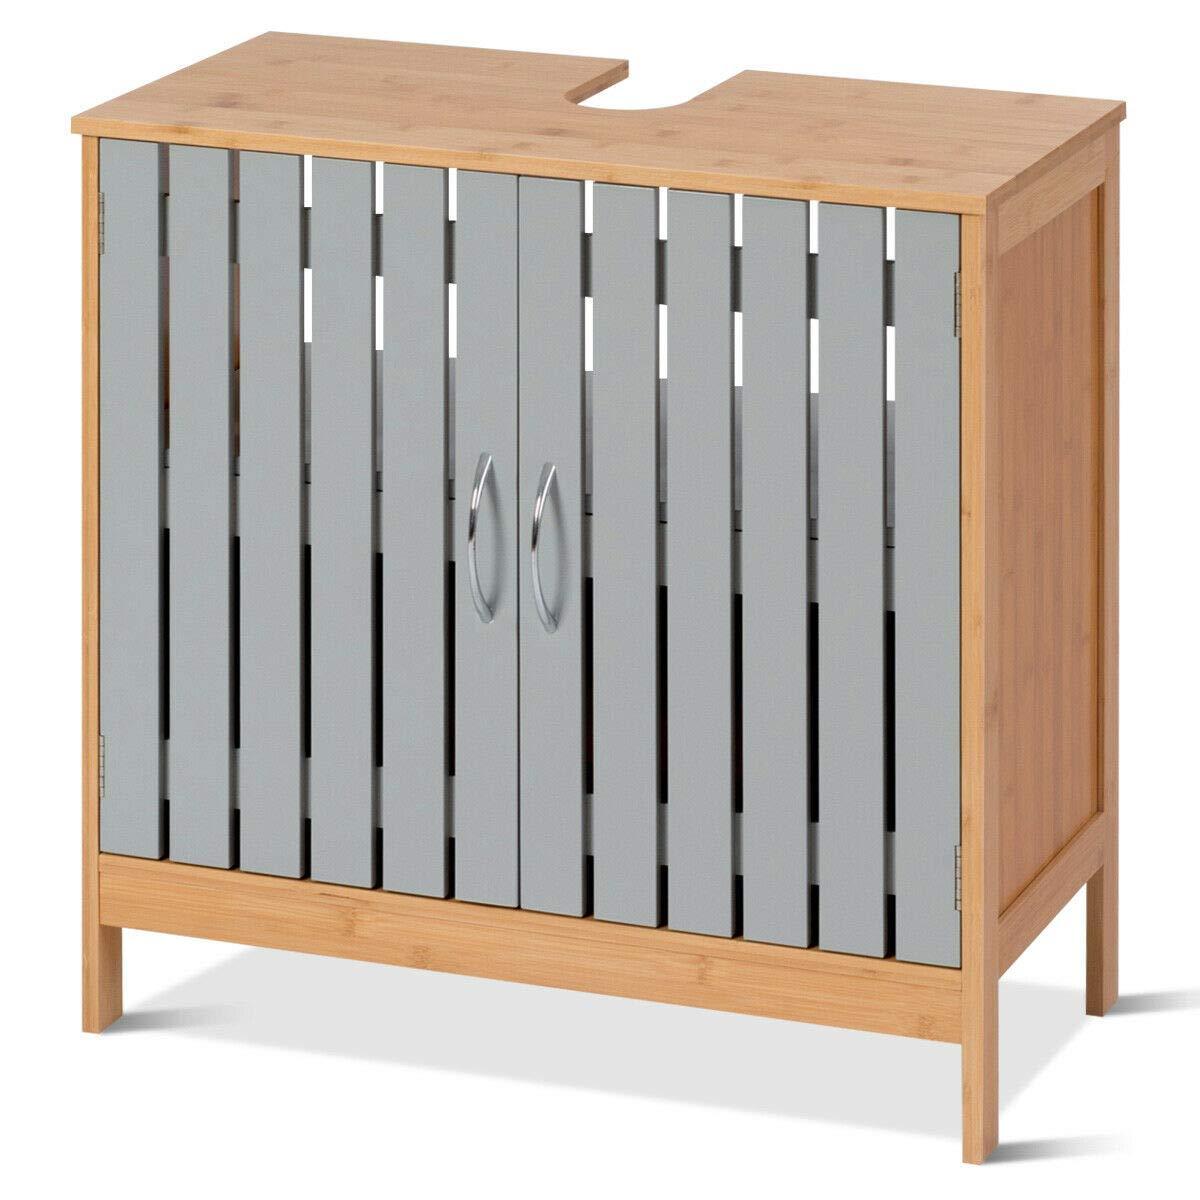 Bathroom Cabinet Shelf Under Sink Vanity Cabinet Bamboo Freestanding Storage